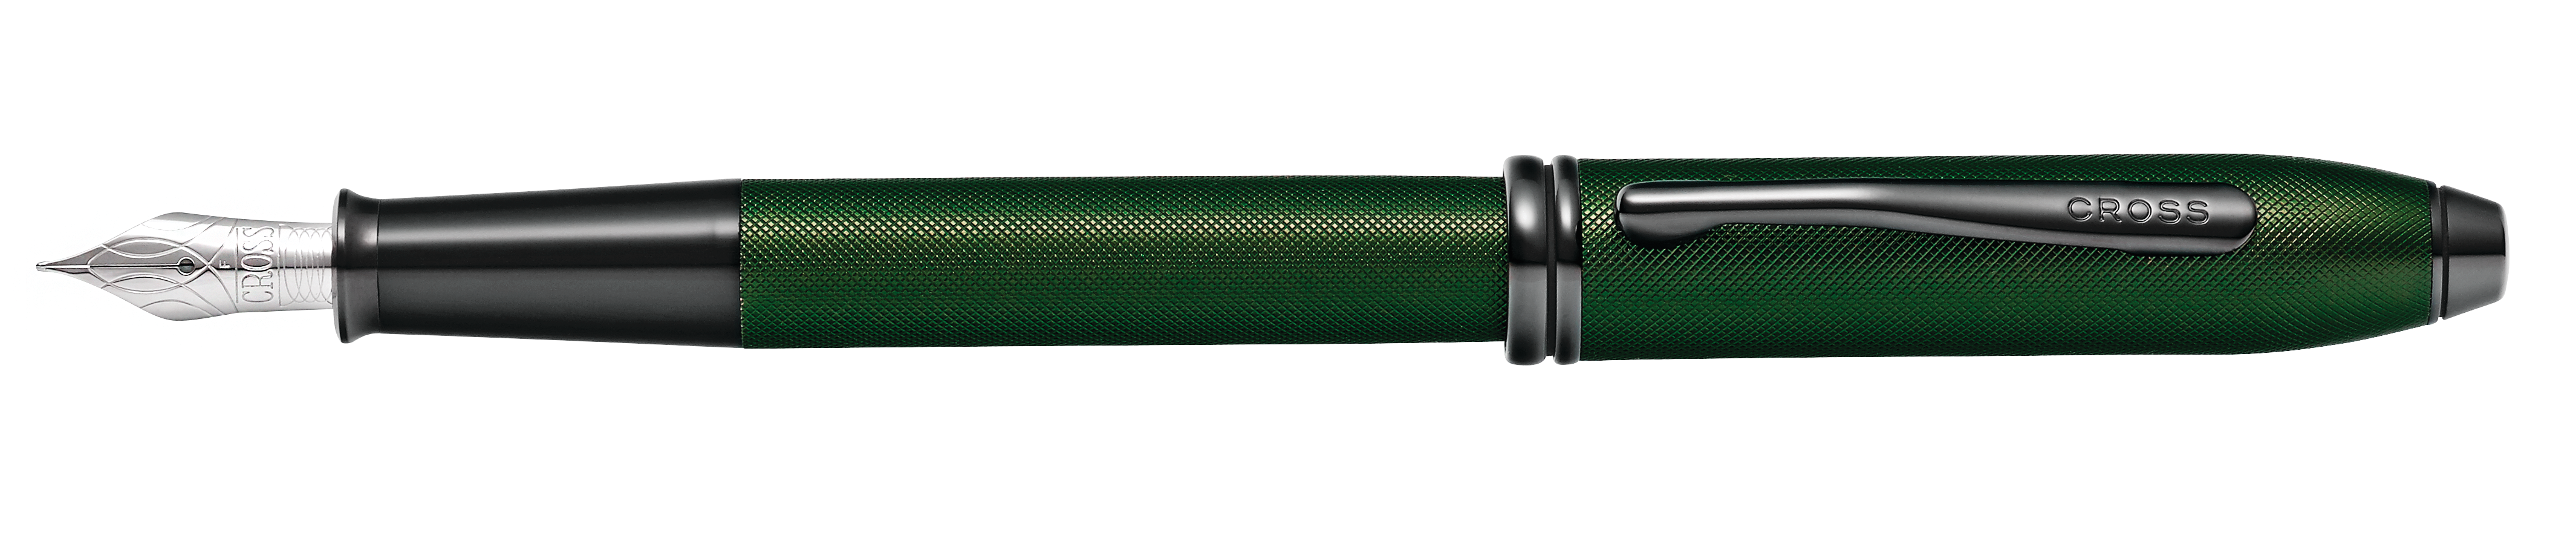 Townsend Matte Green PVD Micro-knurl Fountain Pen